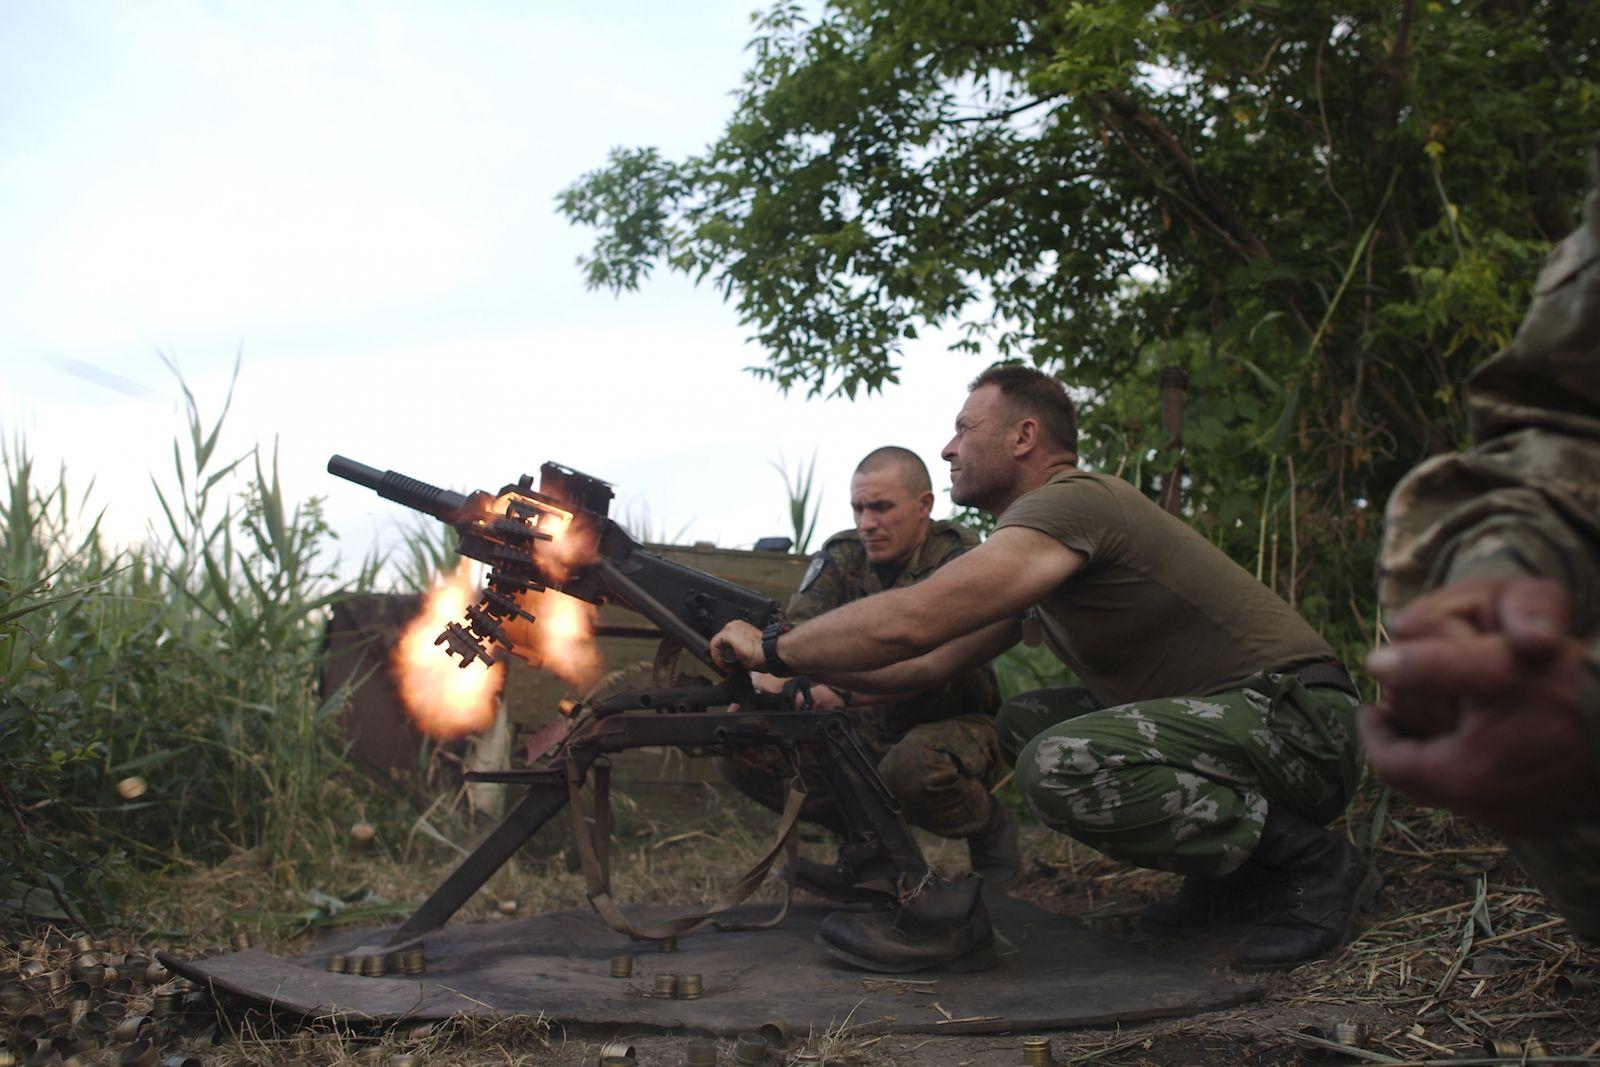 Russian military camp found in Ukraine